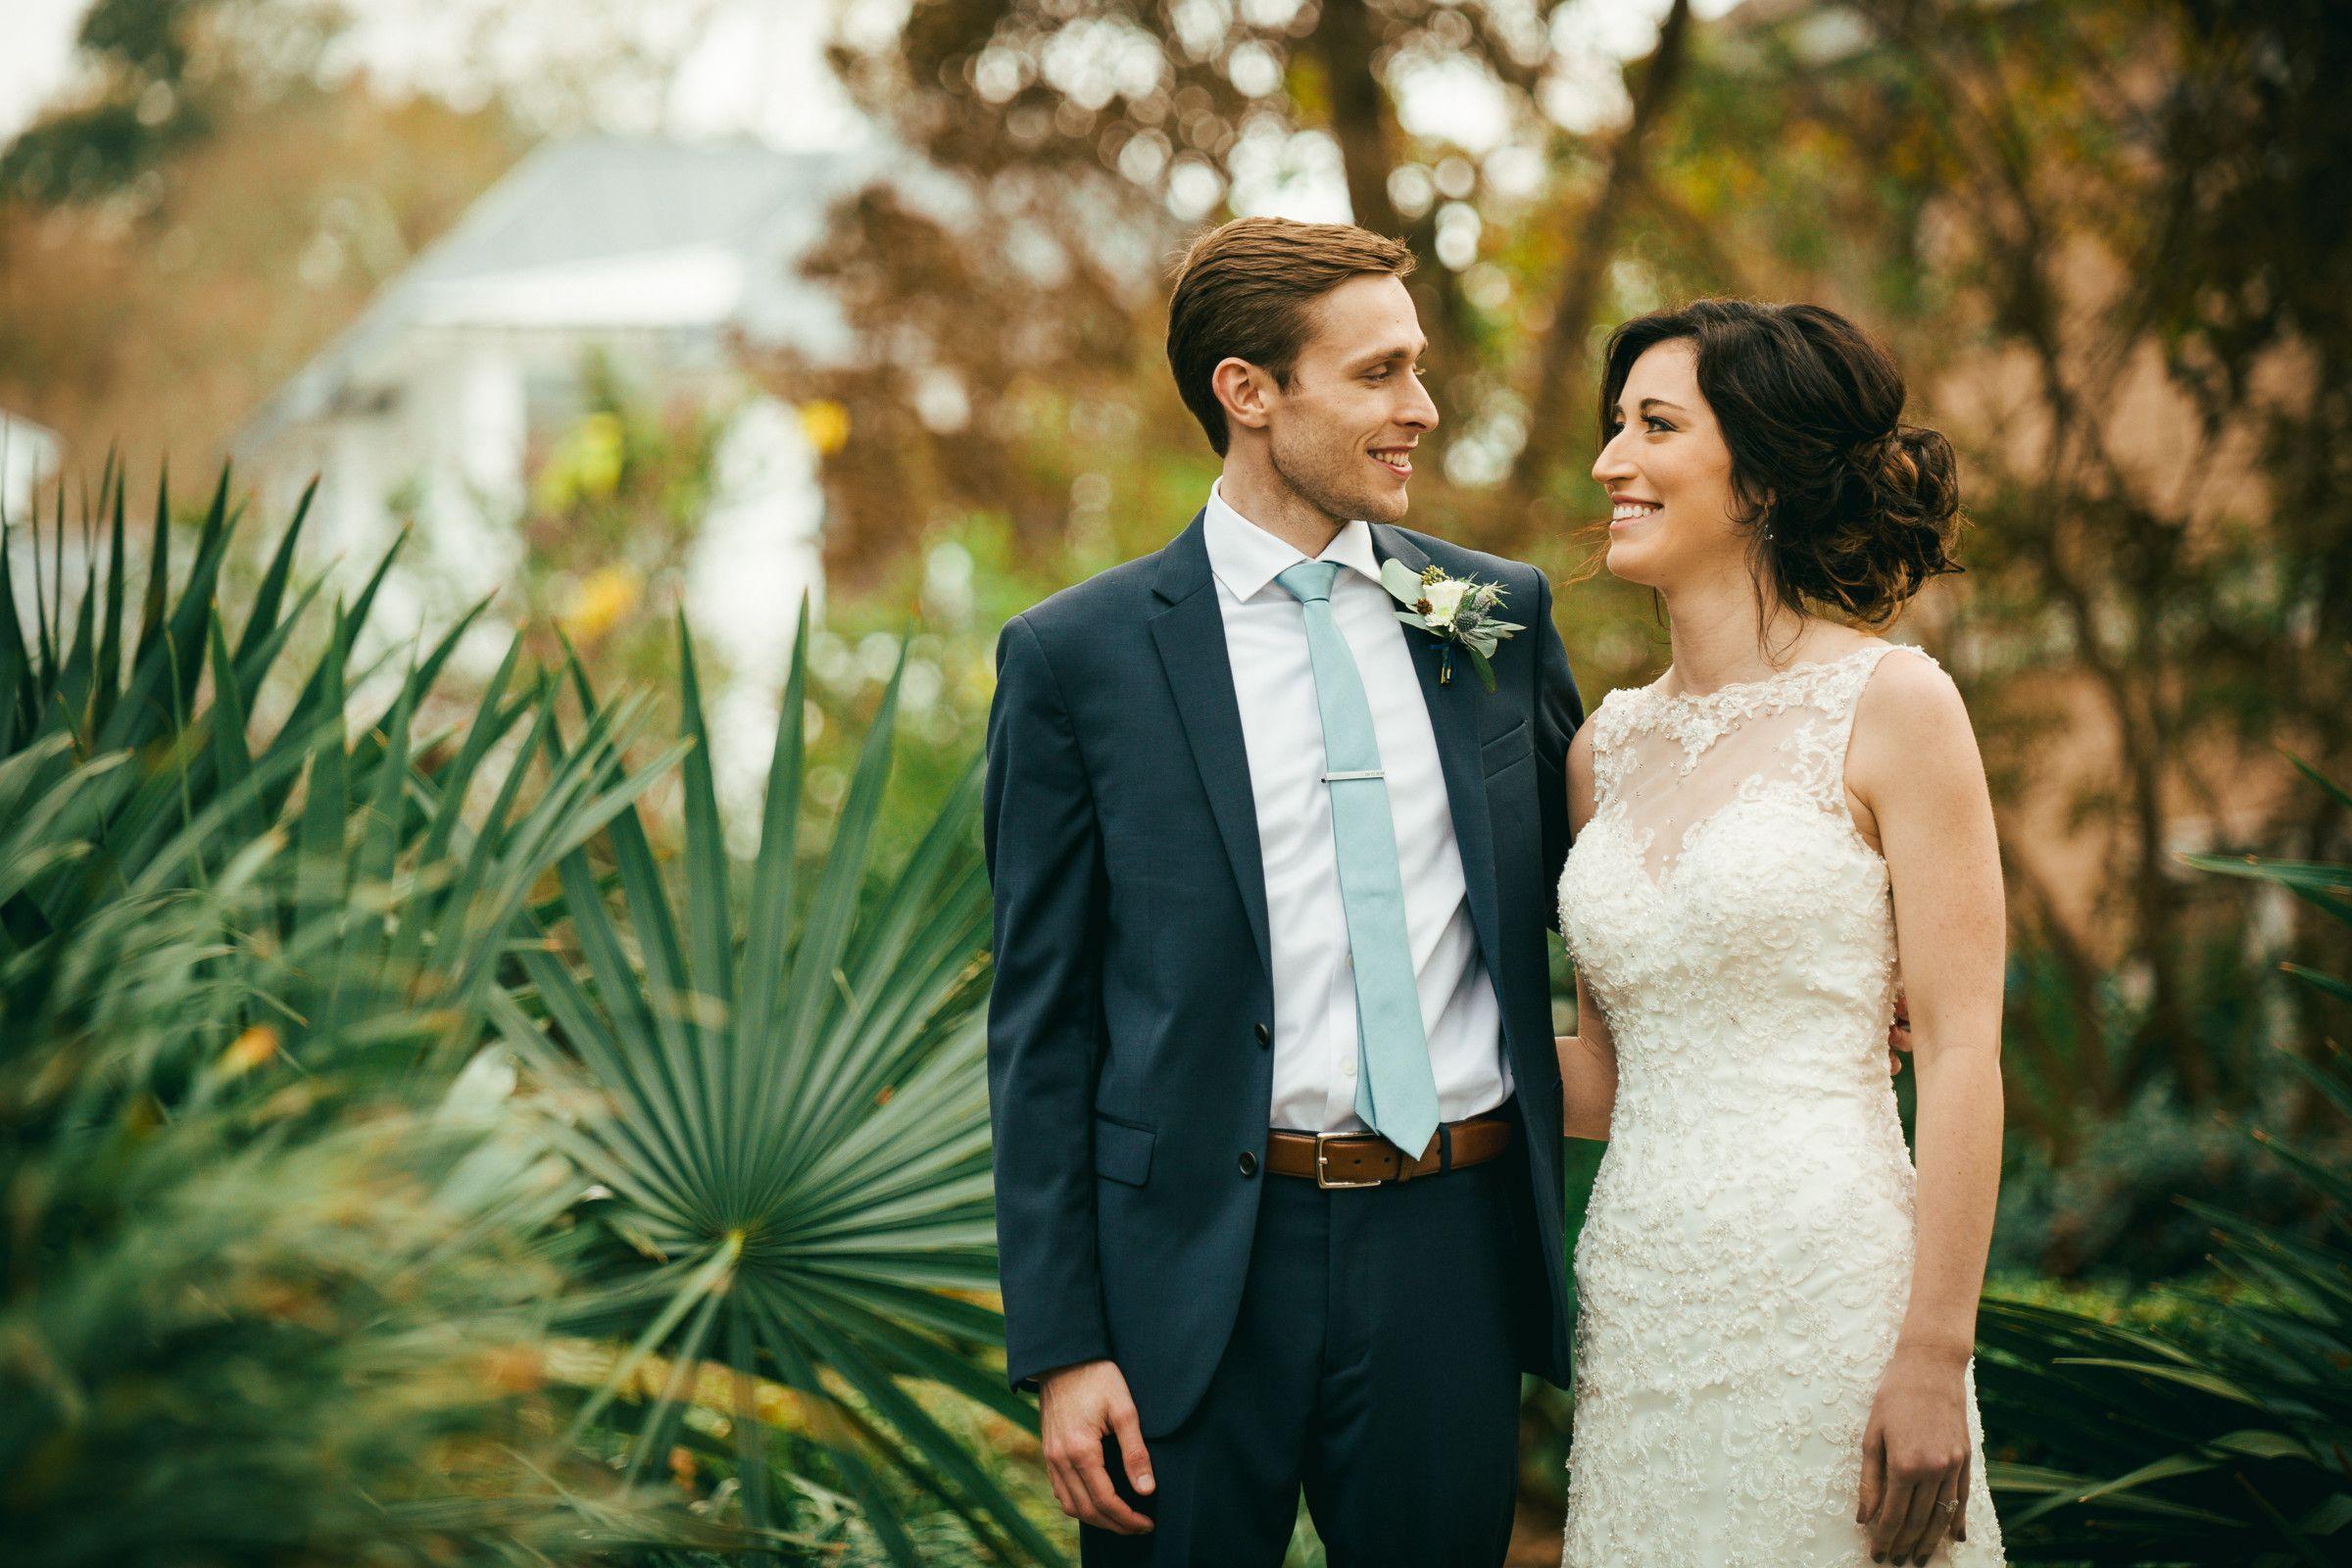 Bright And Vivid Wedding Photography By Charleston Sc Wedding Photographer And Bustld Vetted Vendor James Brindley S Ca Wedding Scene Wedding Plan Your Wedding